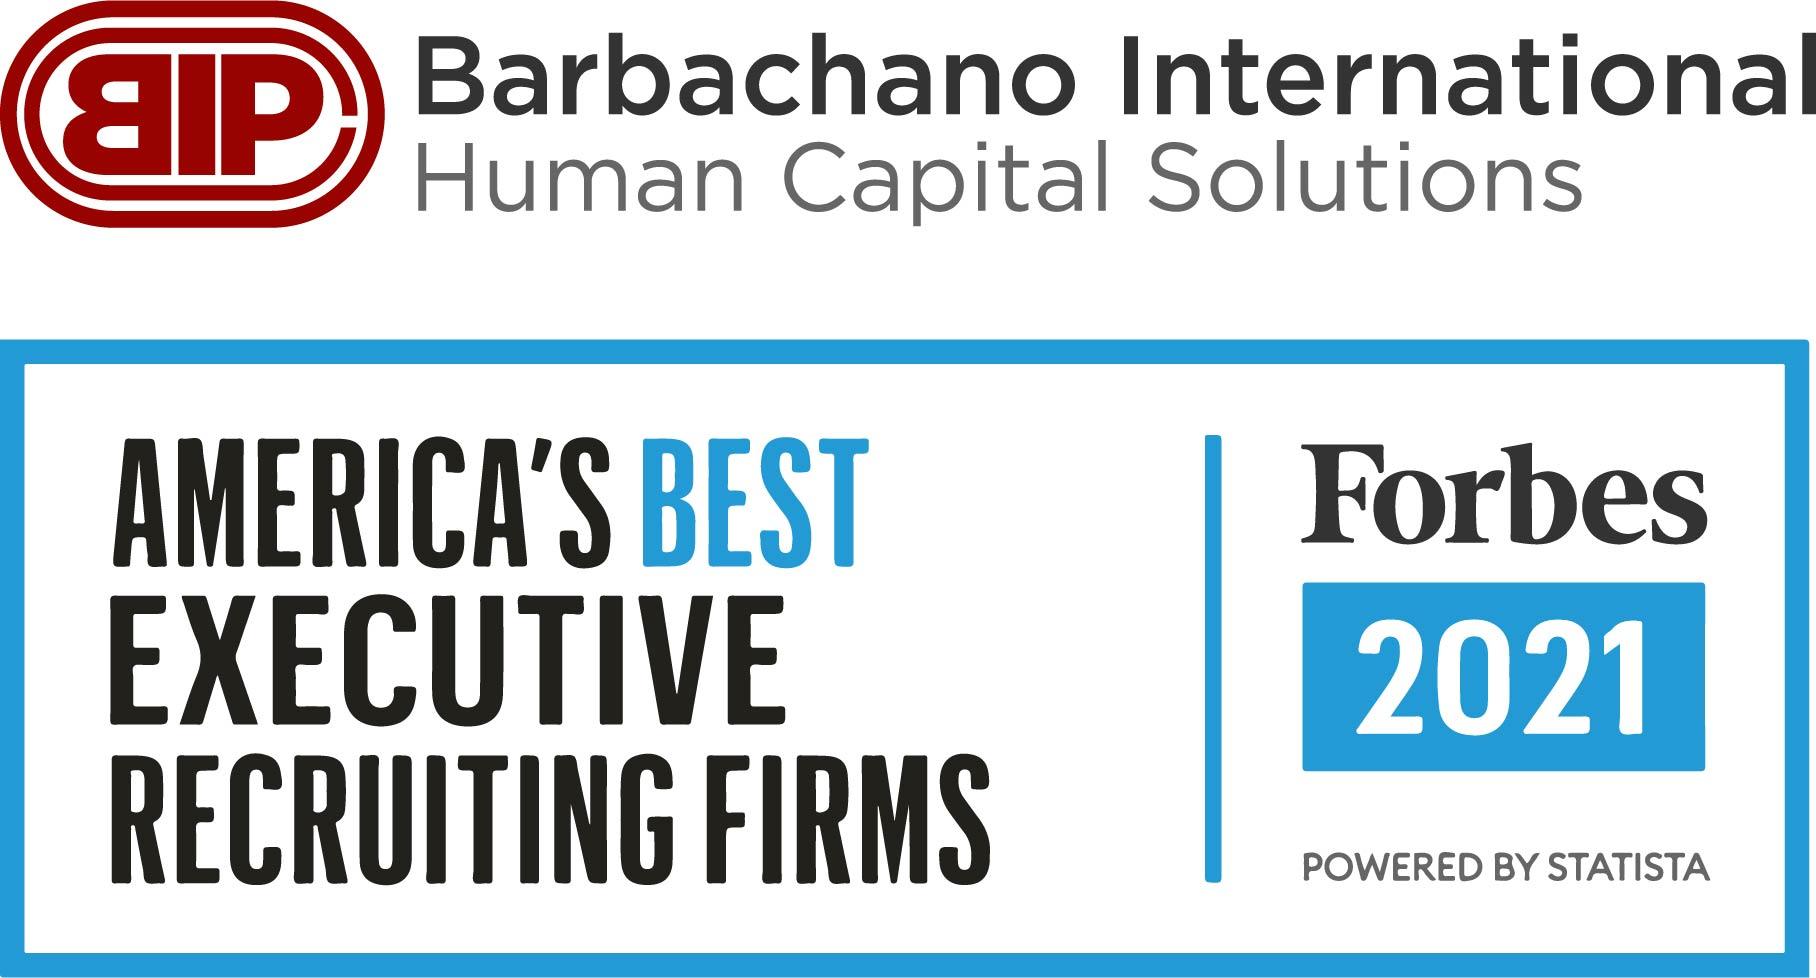 Barbachano International